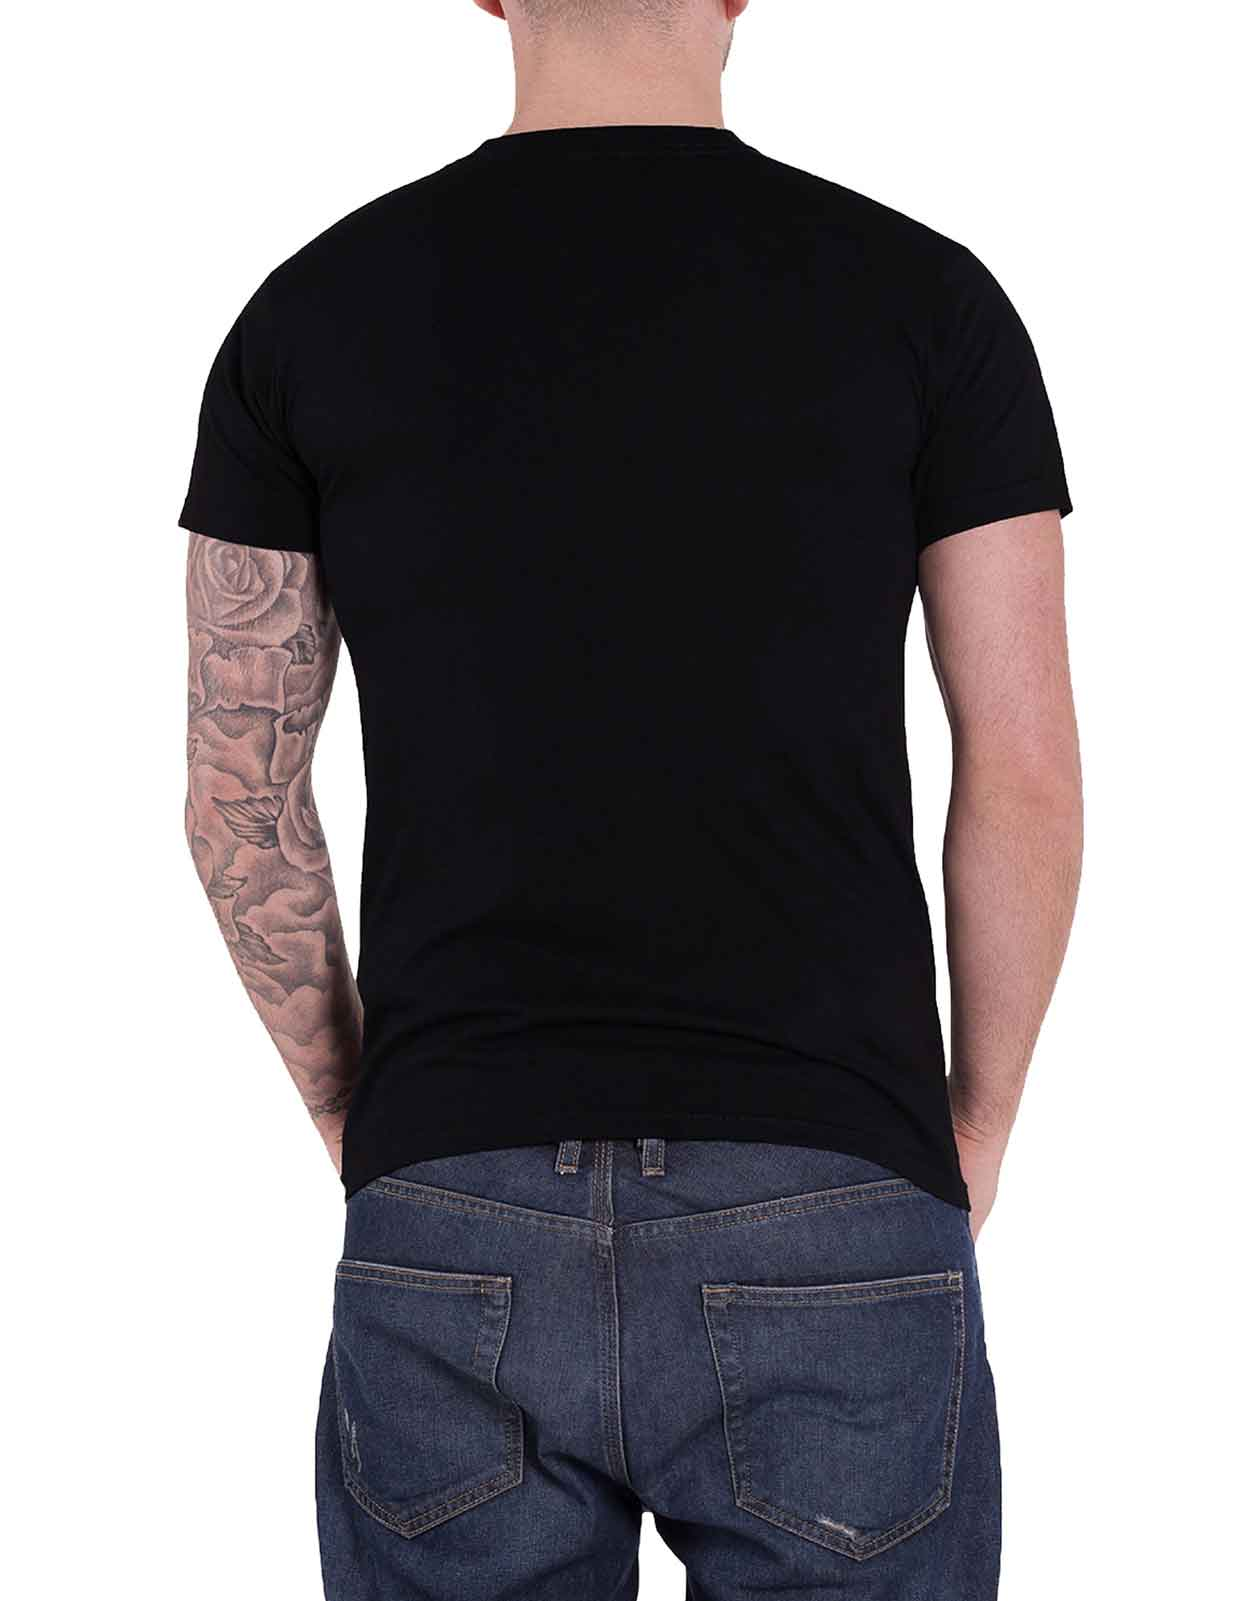 Officiel-Jimi-Hendrix-T-Shirt-Purple-Haze-Are-you-experienced-Logo-Homme-NEUF miniature 25